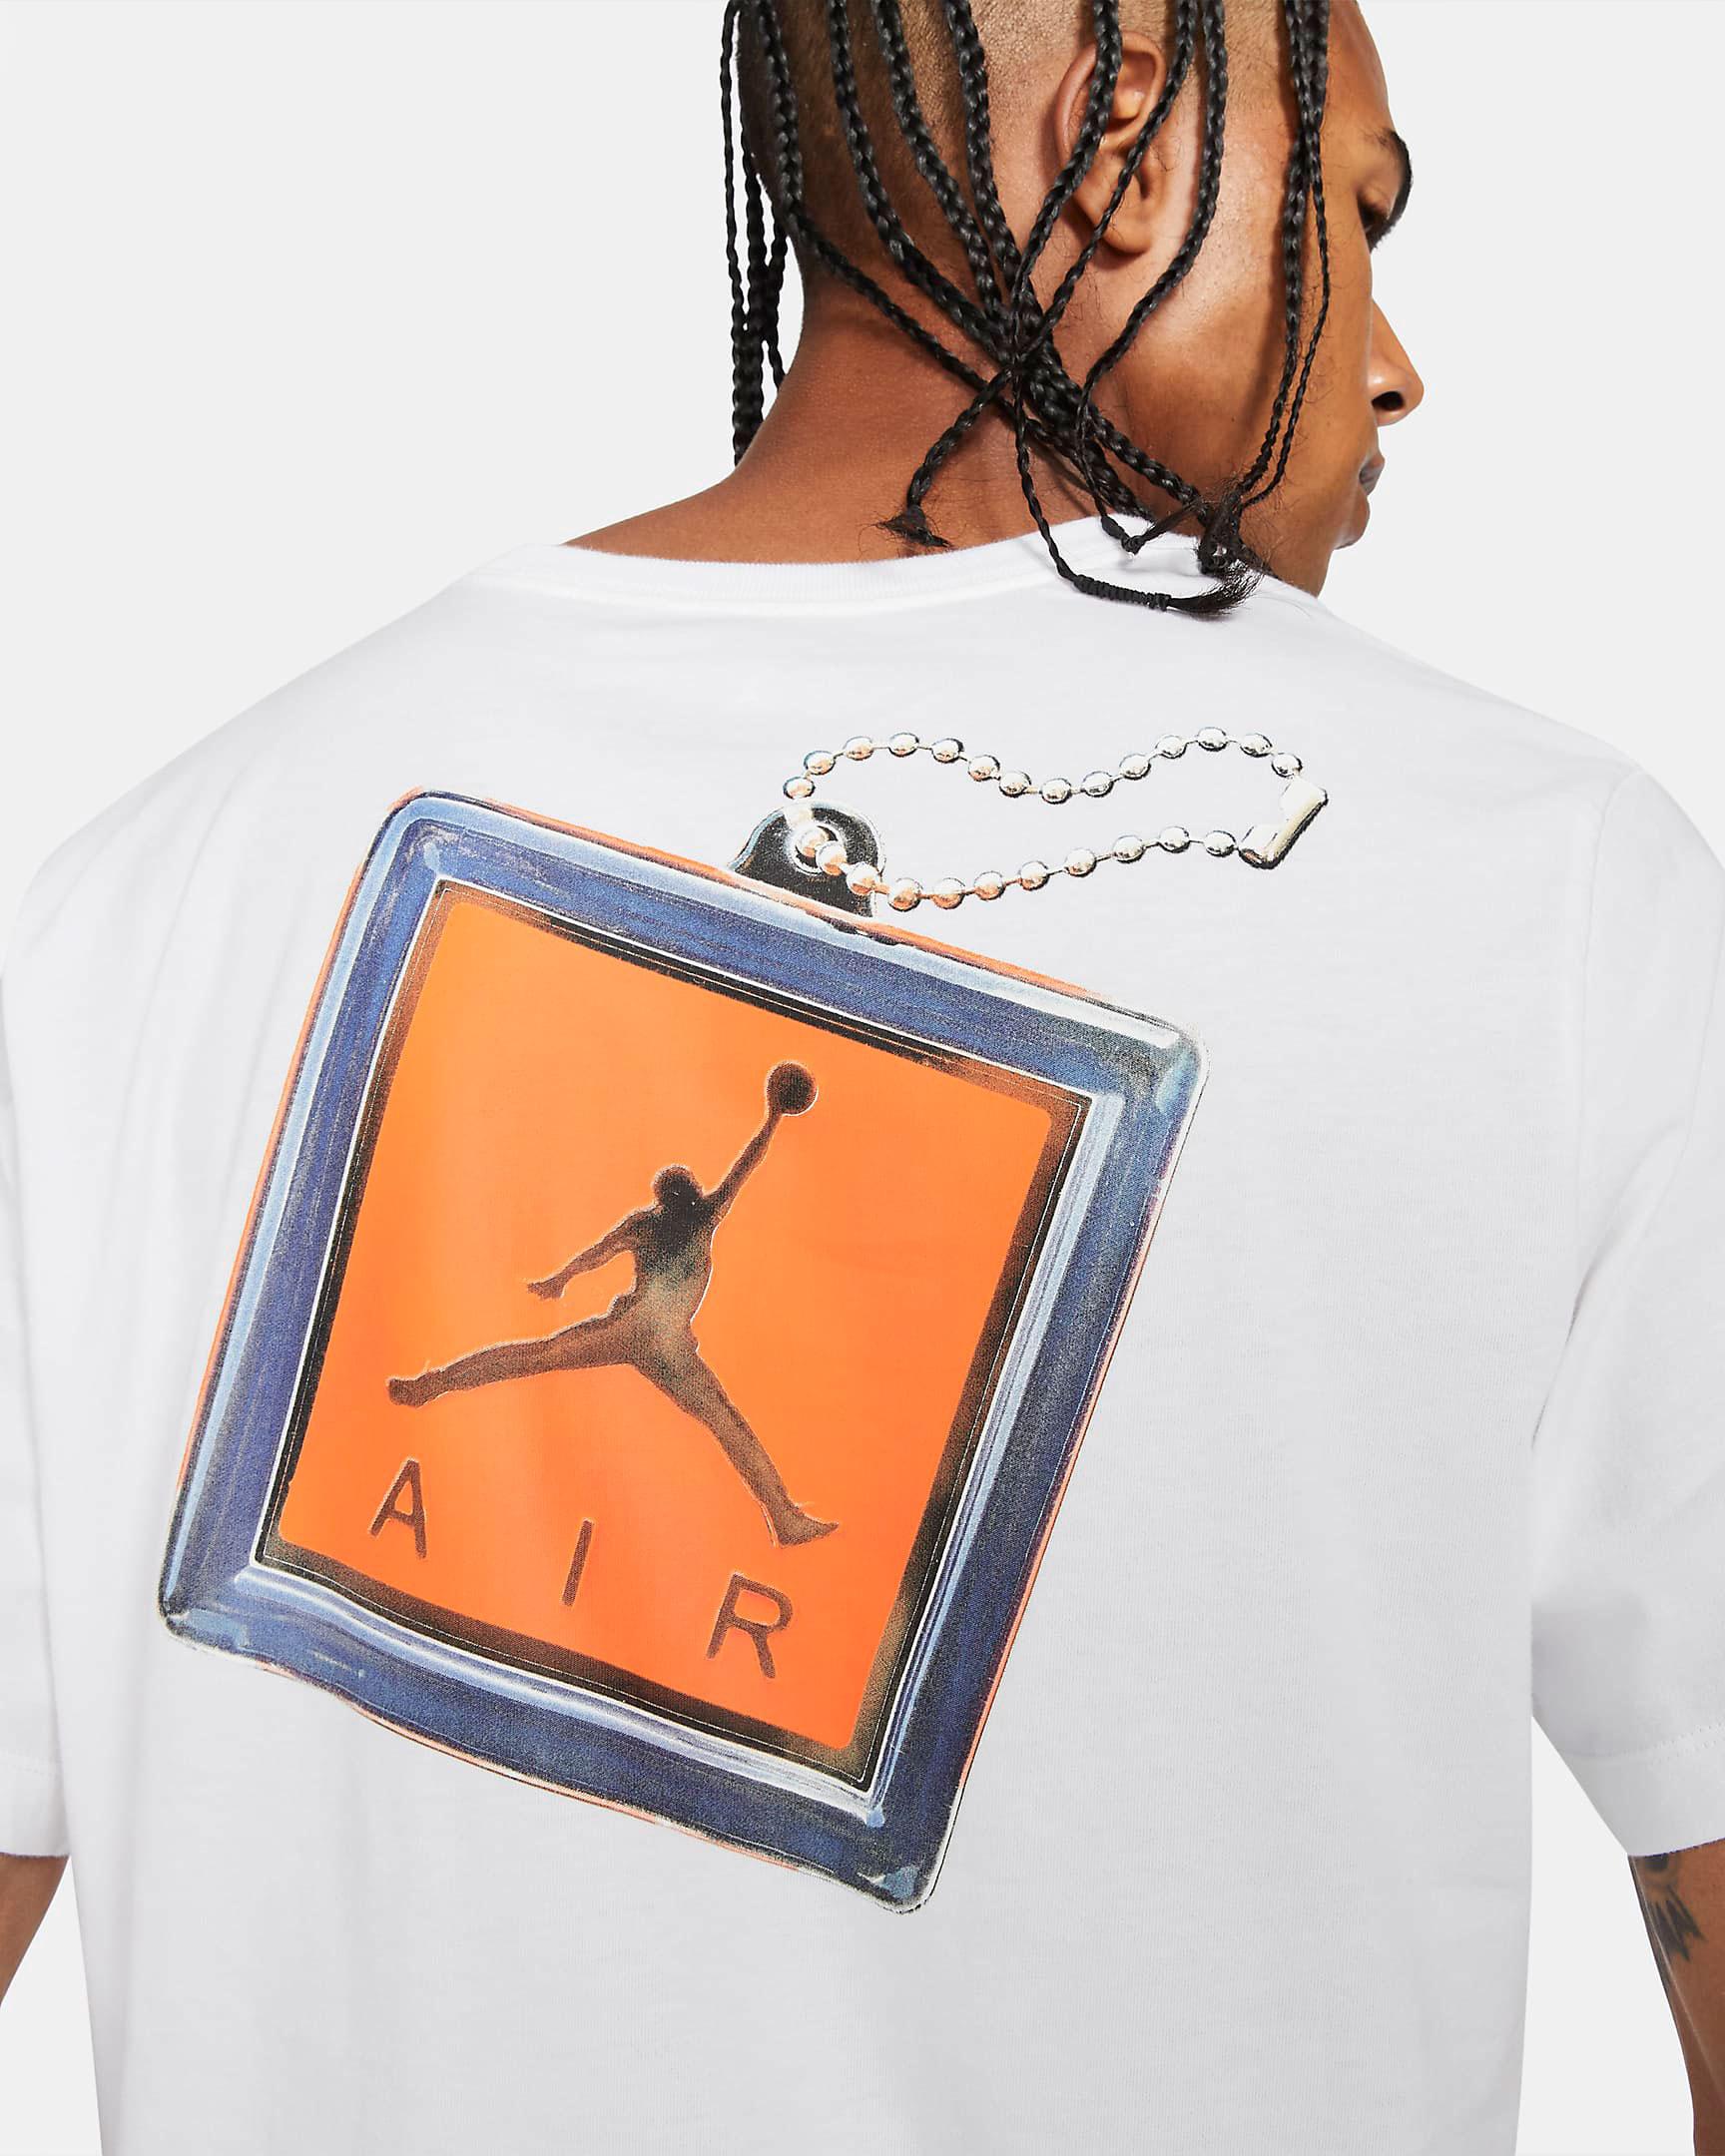 jordan-11-low-bright-citrus-shirt-2